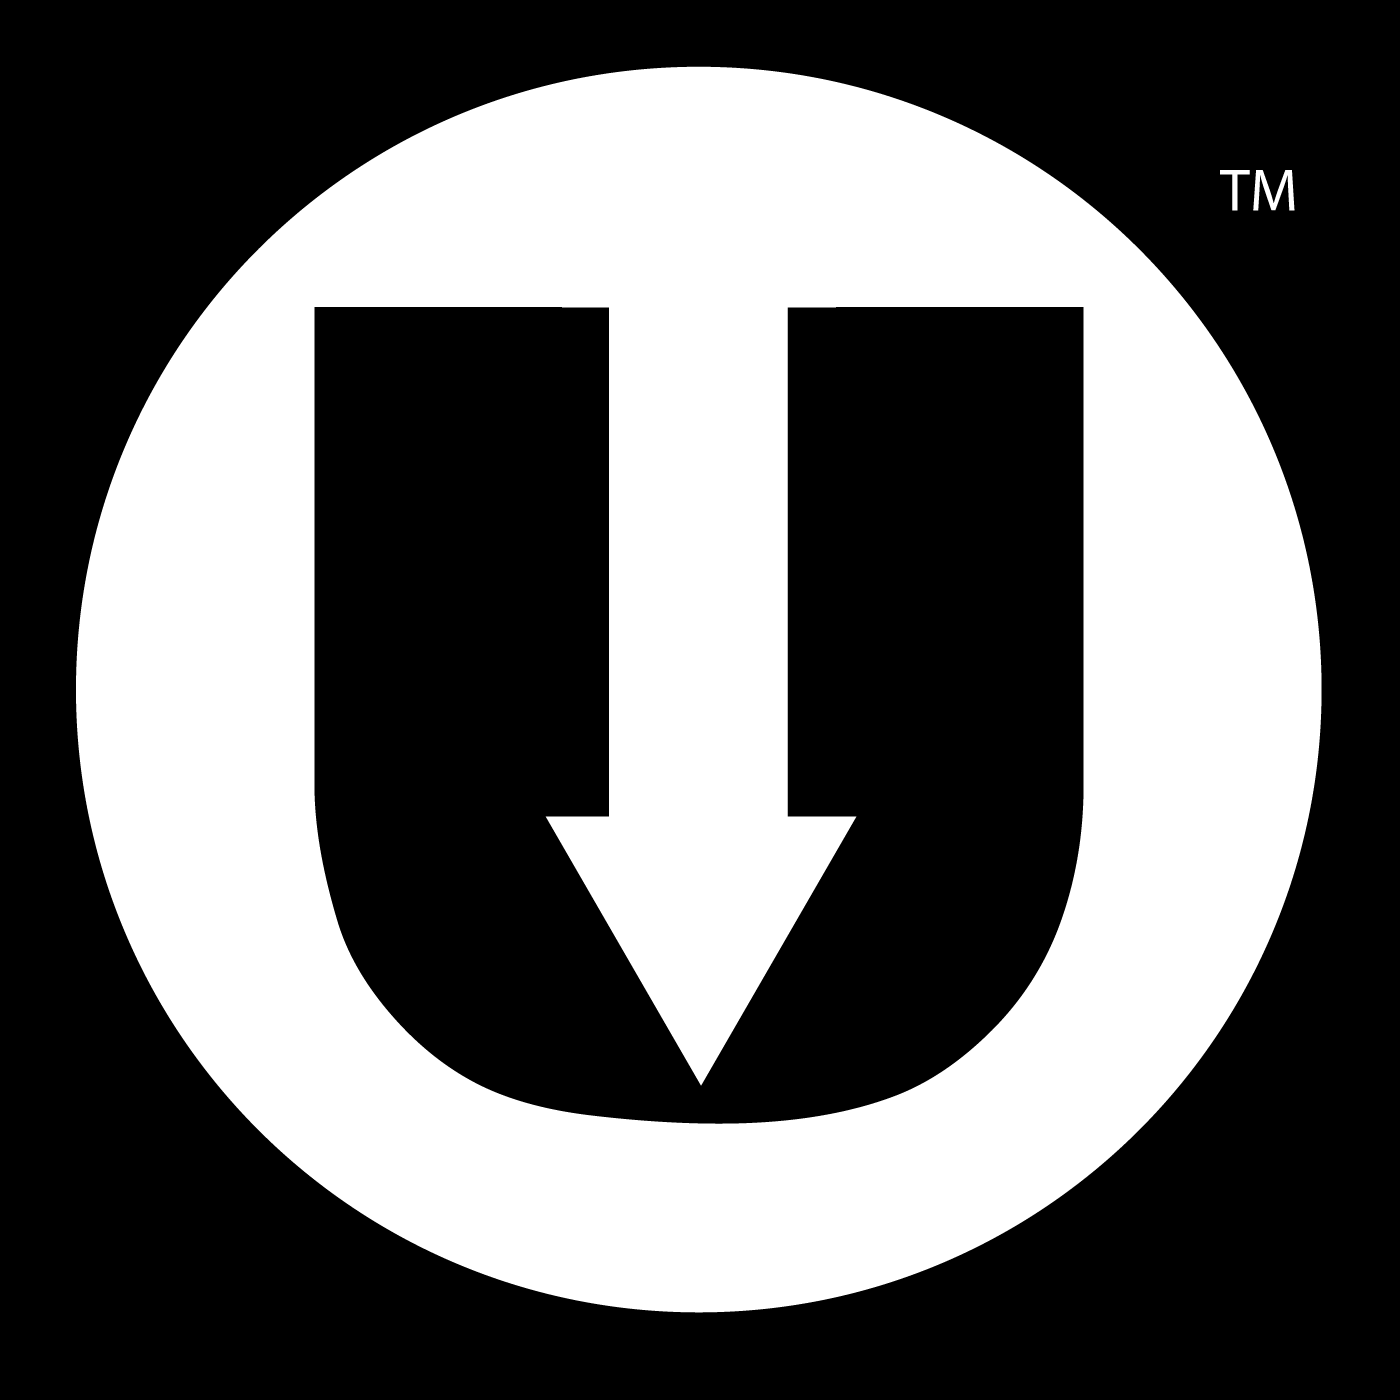 UGTV.org